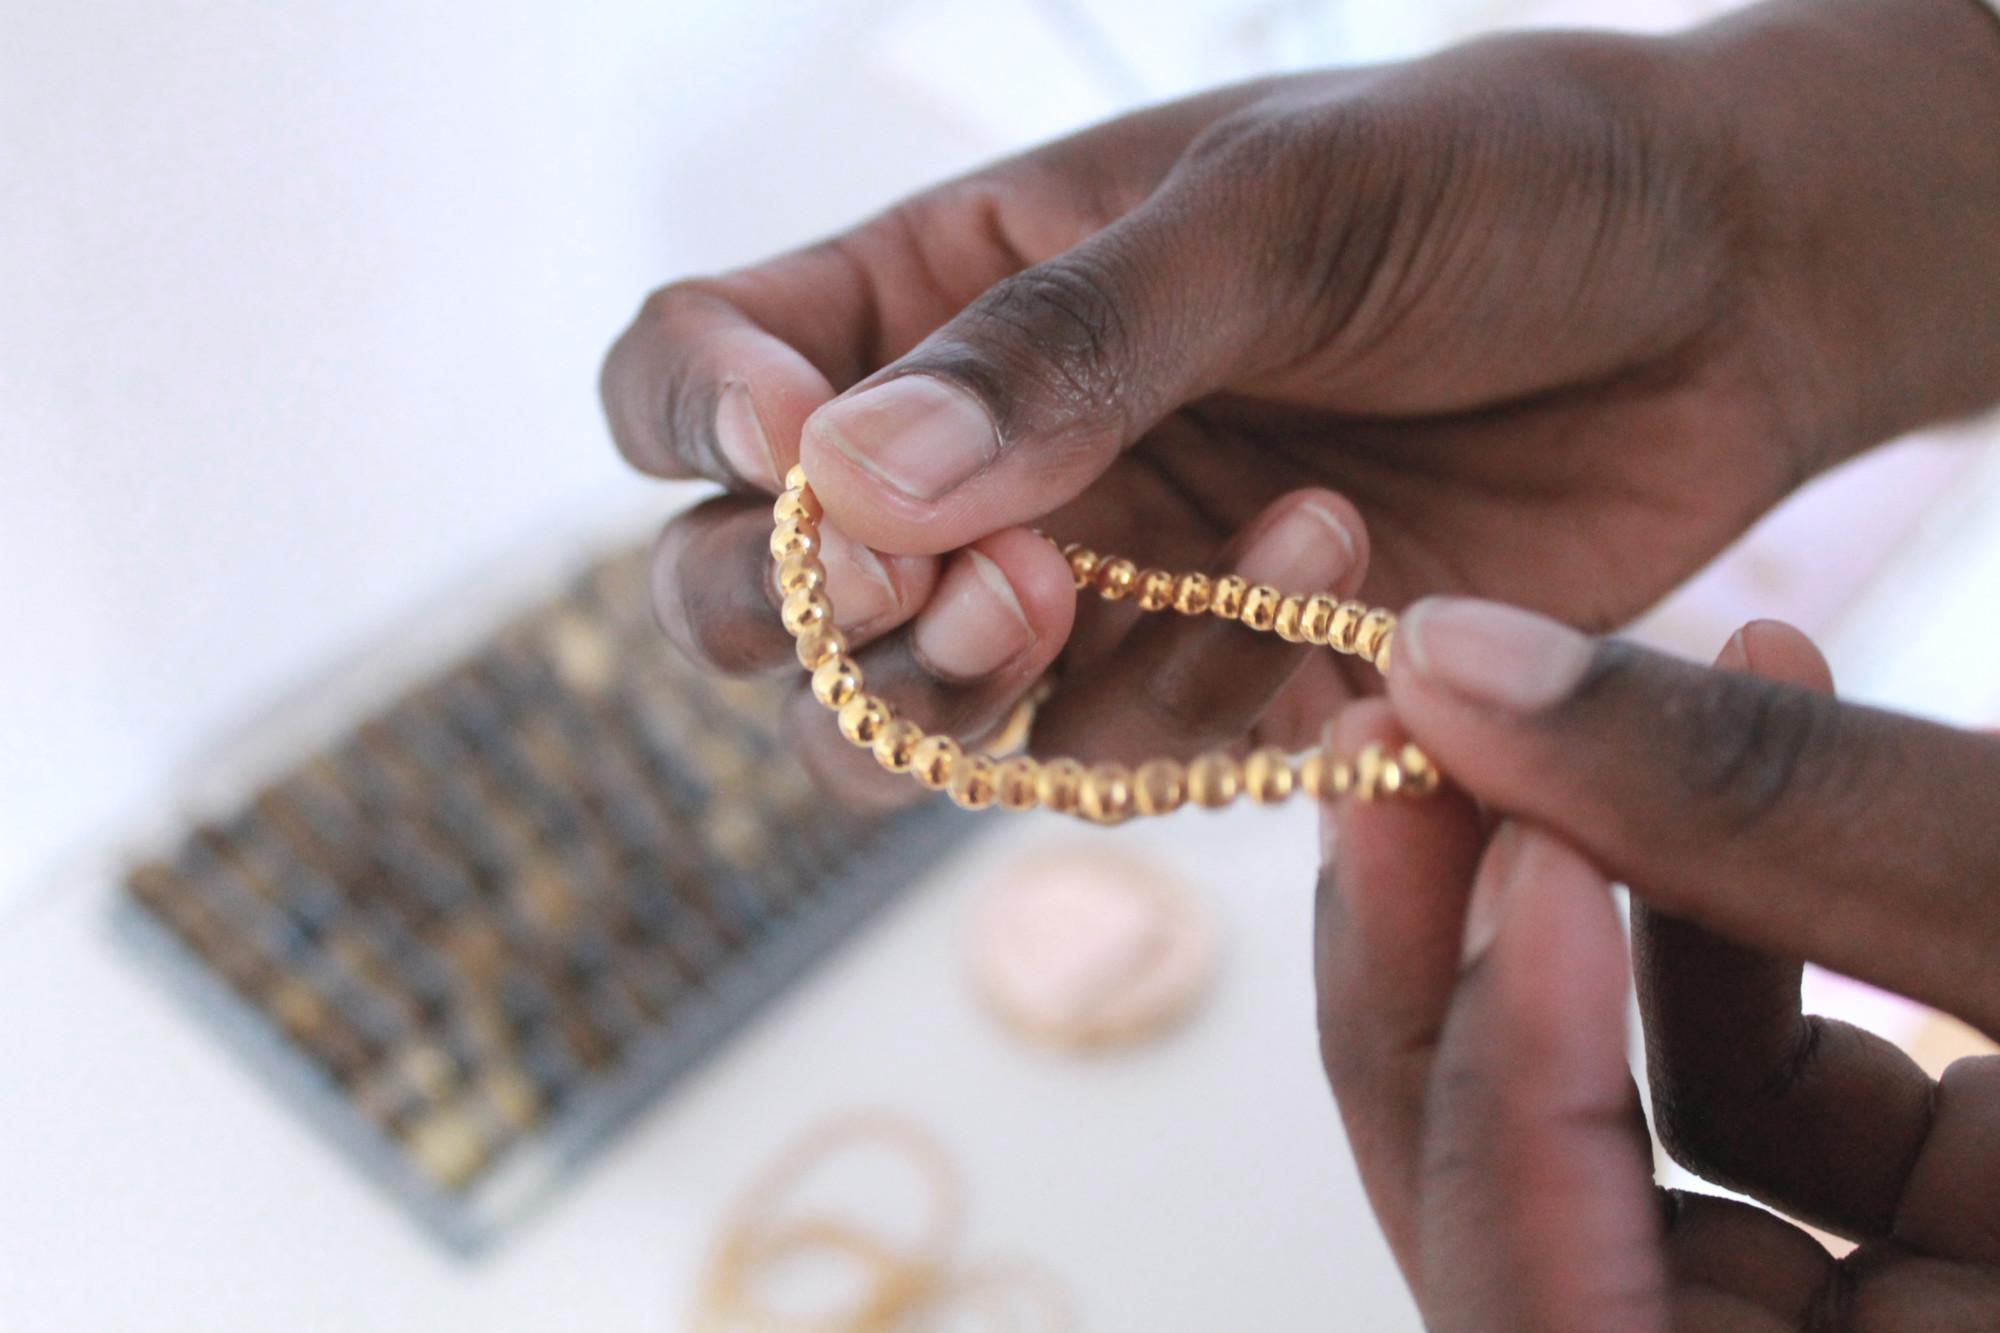 Anusiya hält ein Armband mit goldenen Perlen.